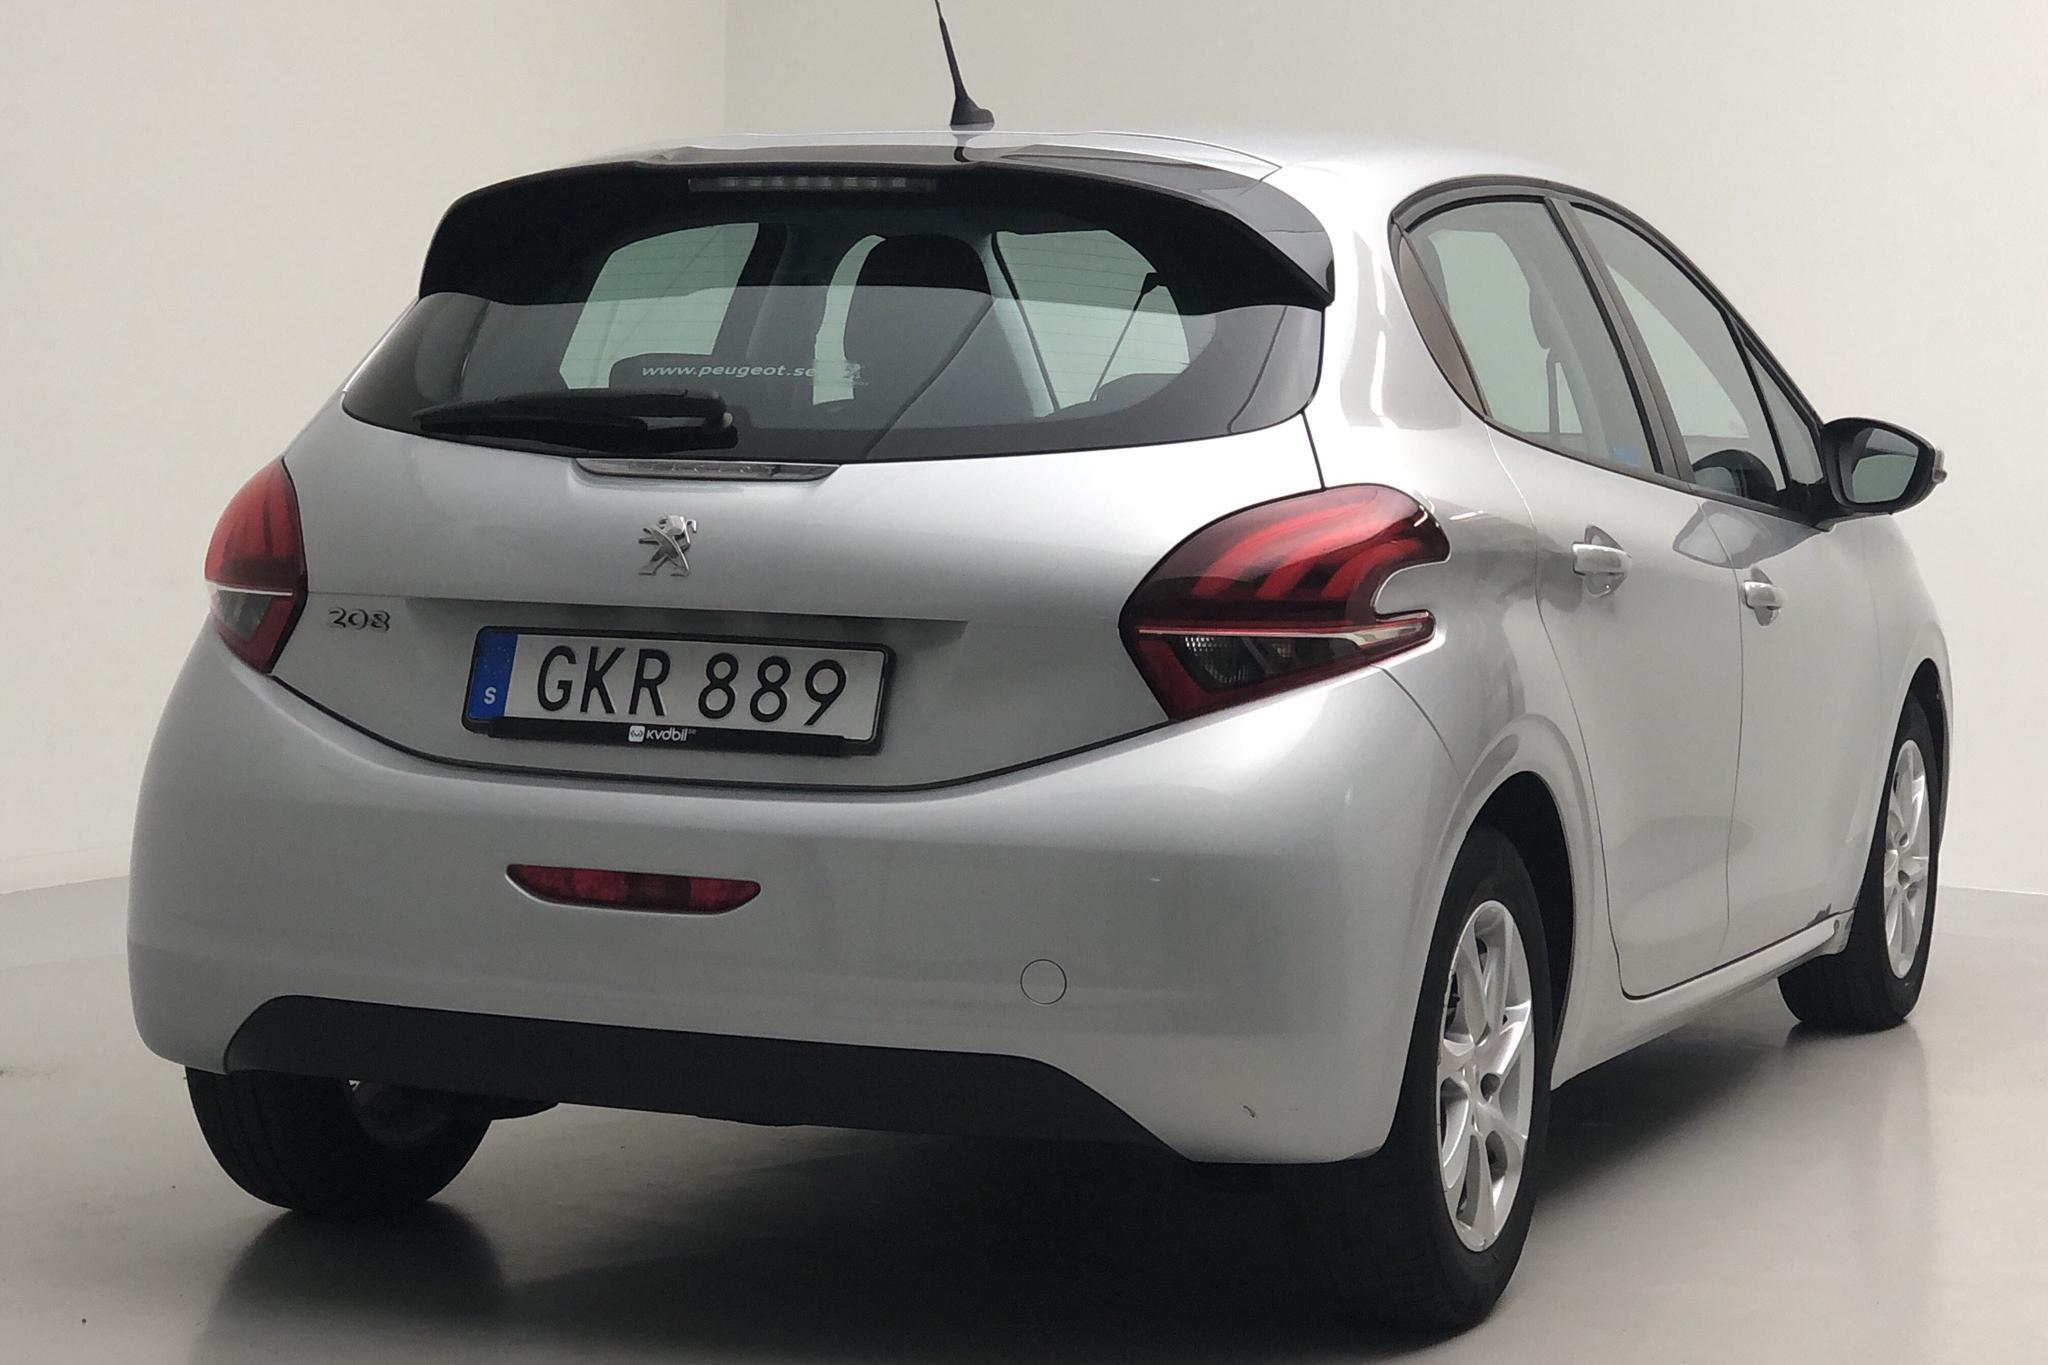 Peugeot 208 BlueHDi 5dr (100hk) - 3 748 mil - Manuell - Light Grey - 2017